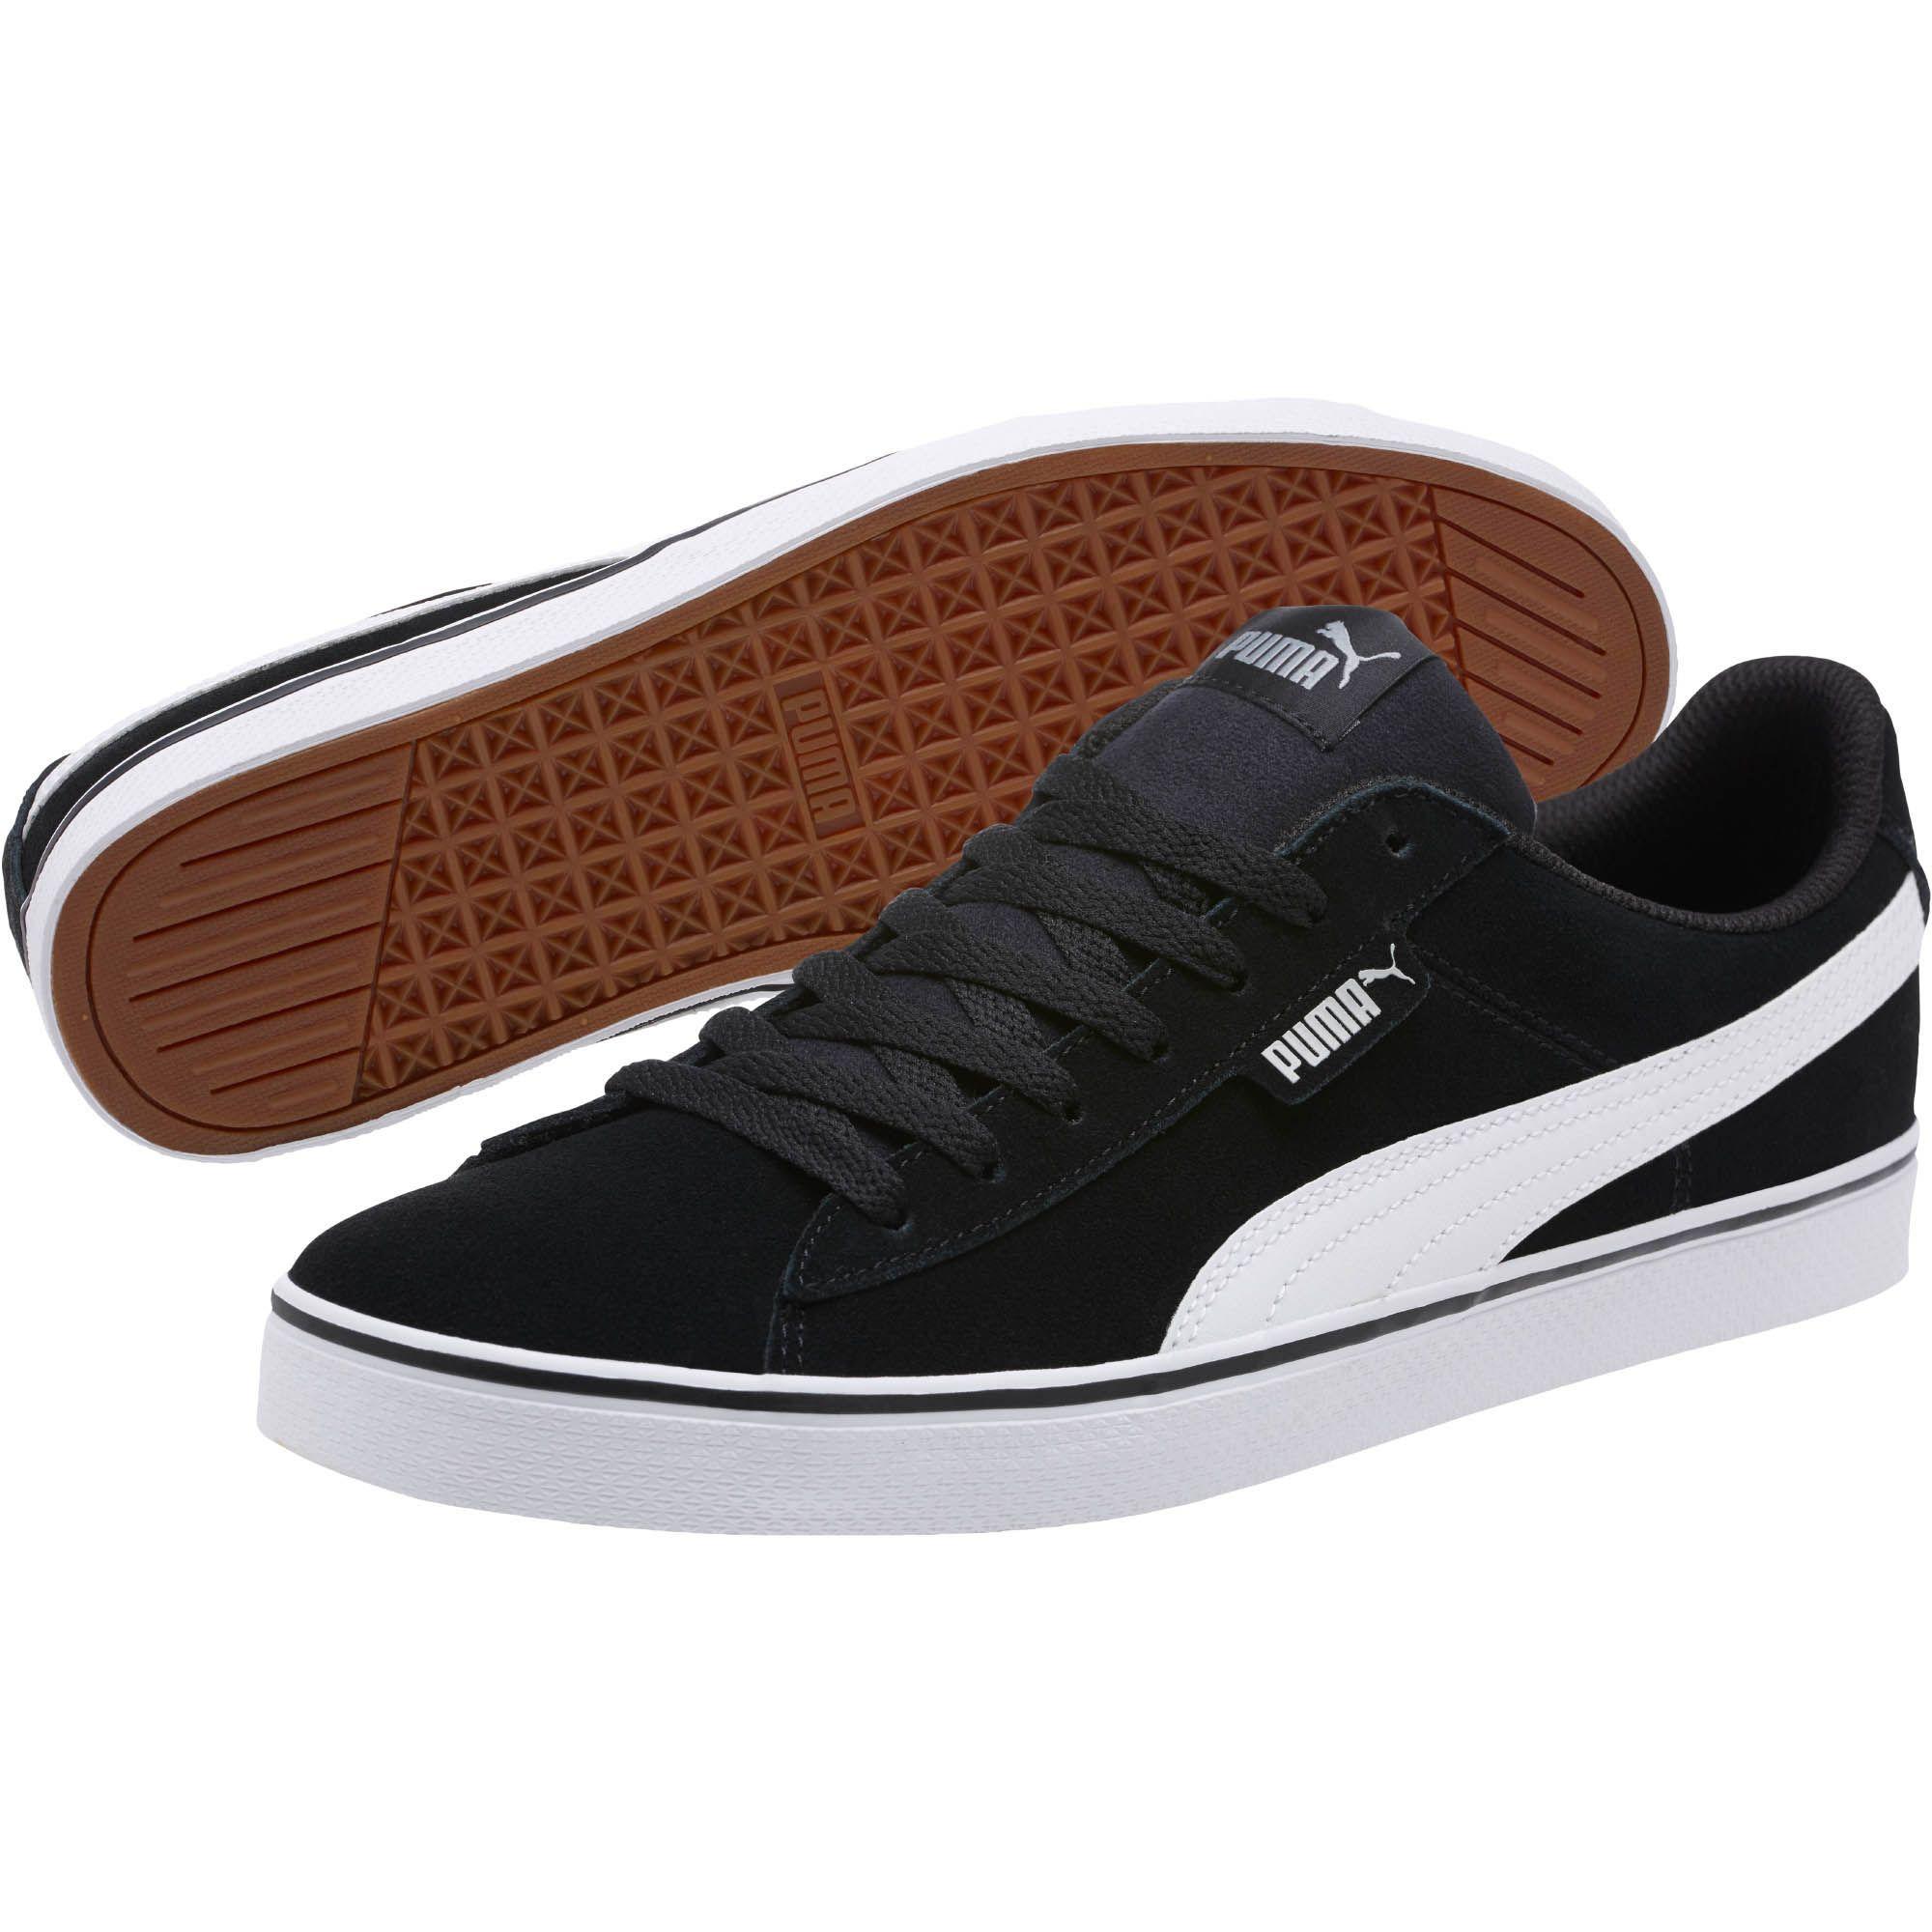 PUMA-Puma-1948-Vulc-Men-s-Sneakers-Men-Low-Boot-Basics-New ... 847df532c